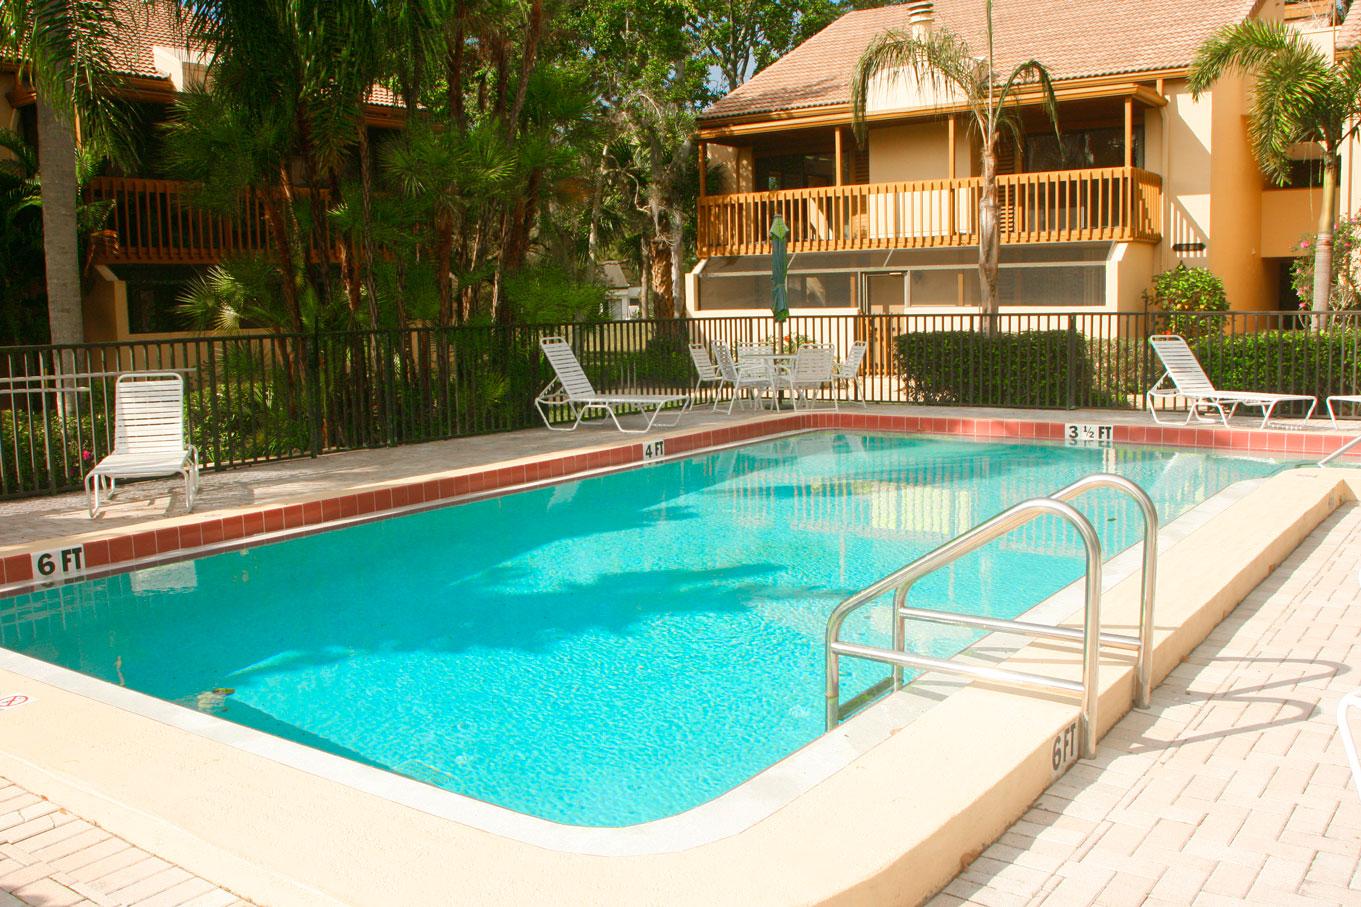 ... Meadows Homes For Sale In Sarasota Fl. - Heated pool ...